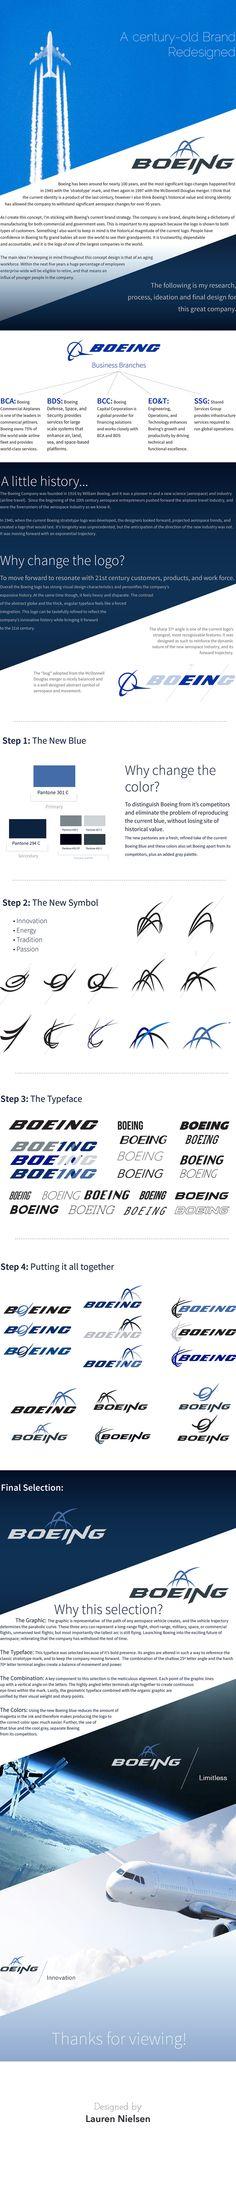 Boeing | Logo Redesign Concept